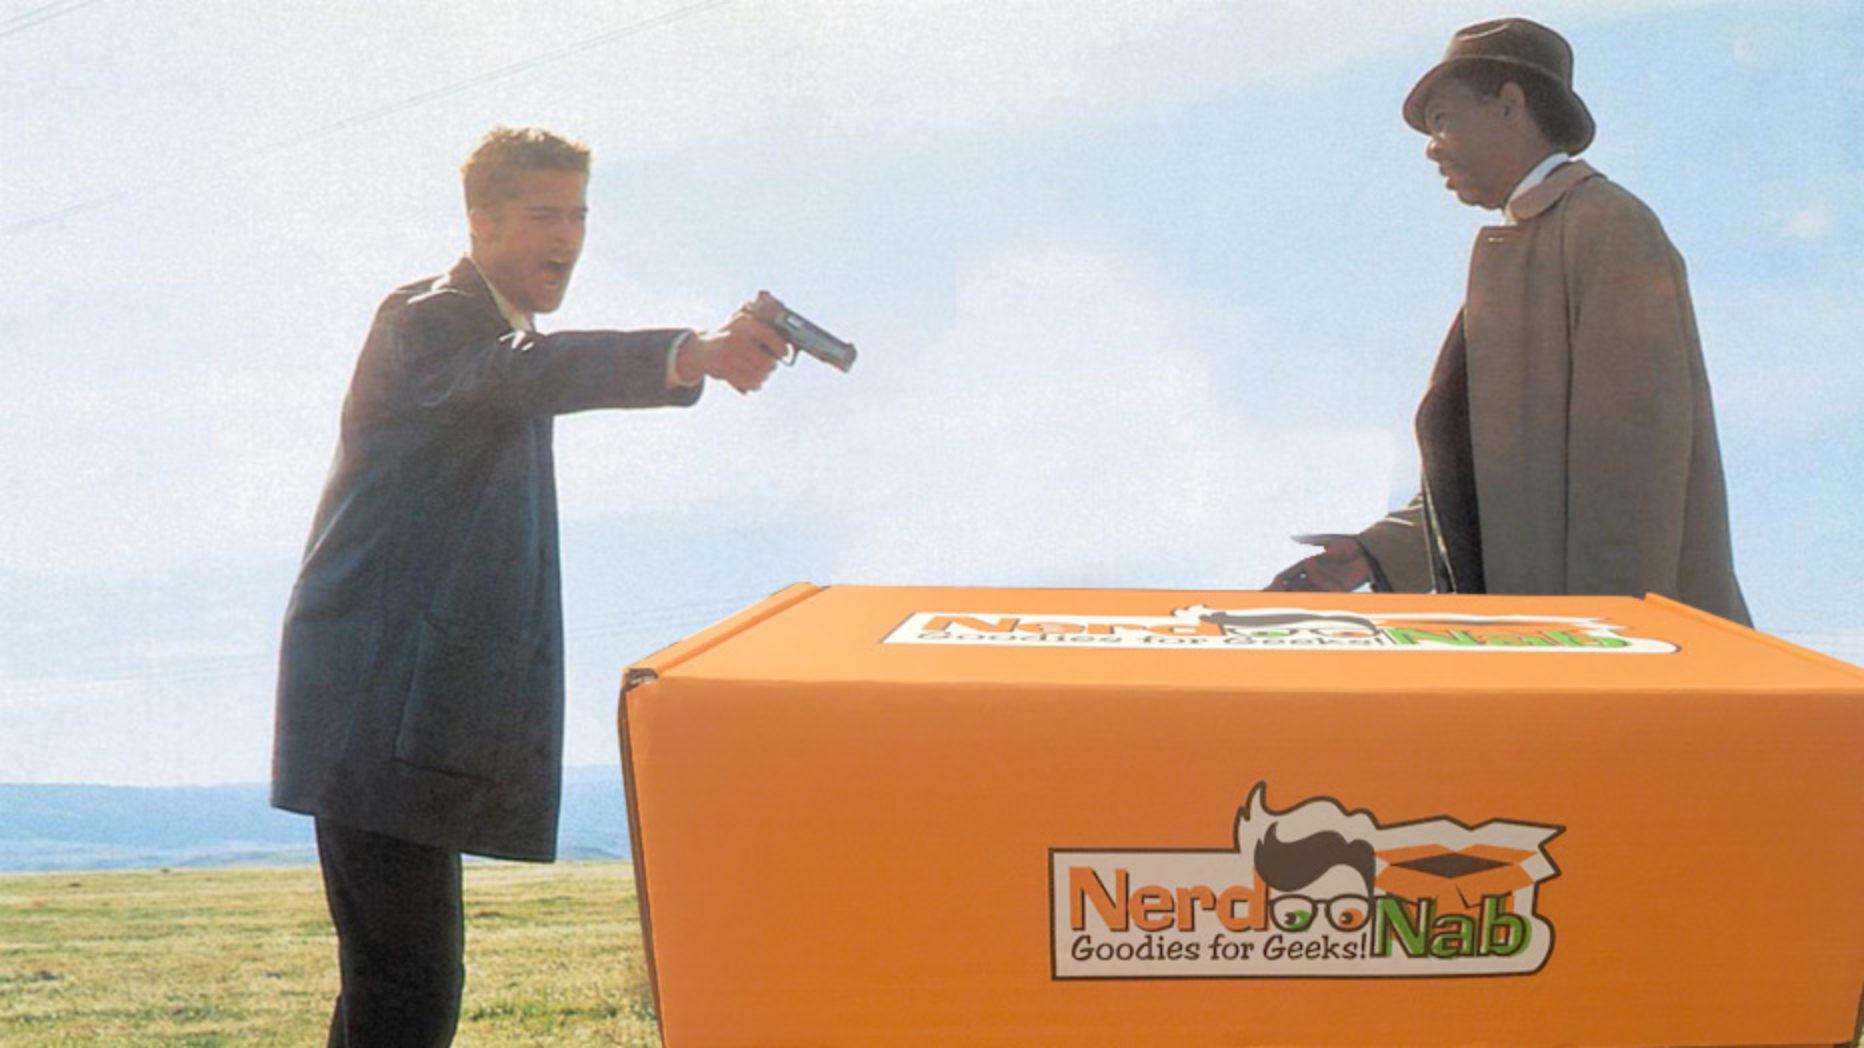 NerdNab Oct/Nov 2016 – What's in the Box!?